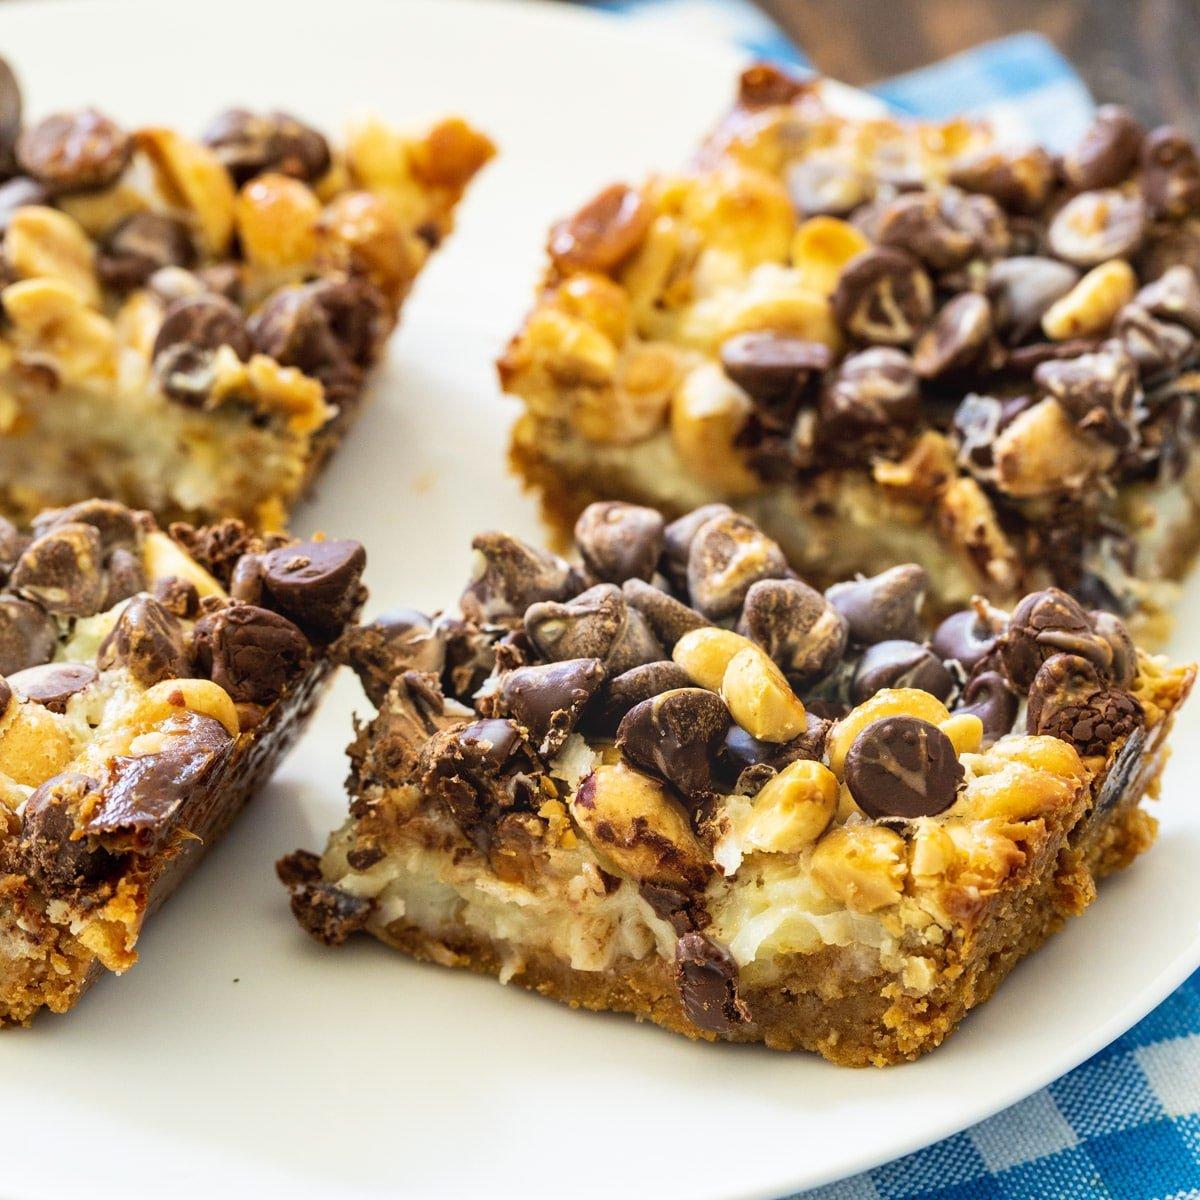 Chocolate and Peanut Graham Bars on a plate.